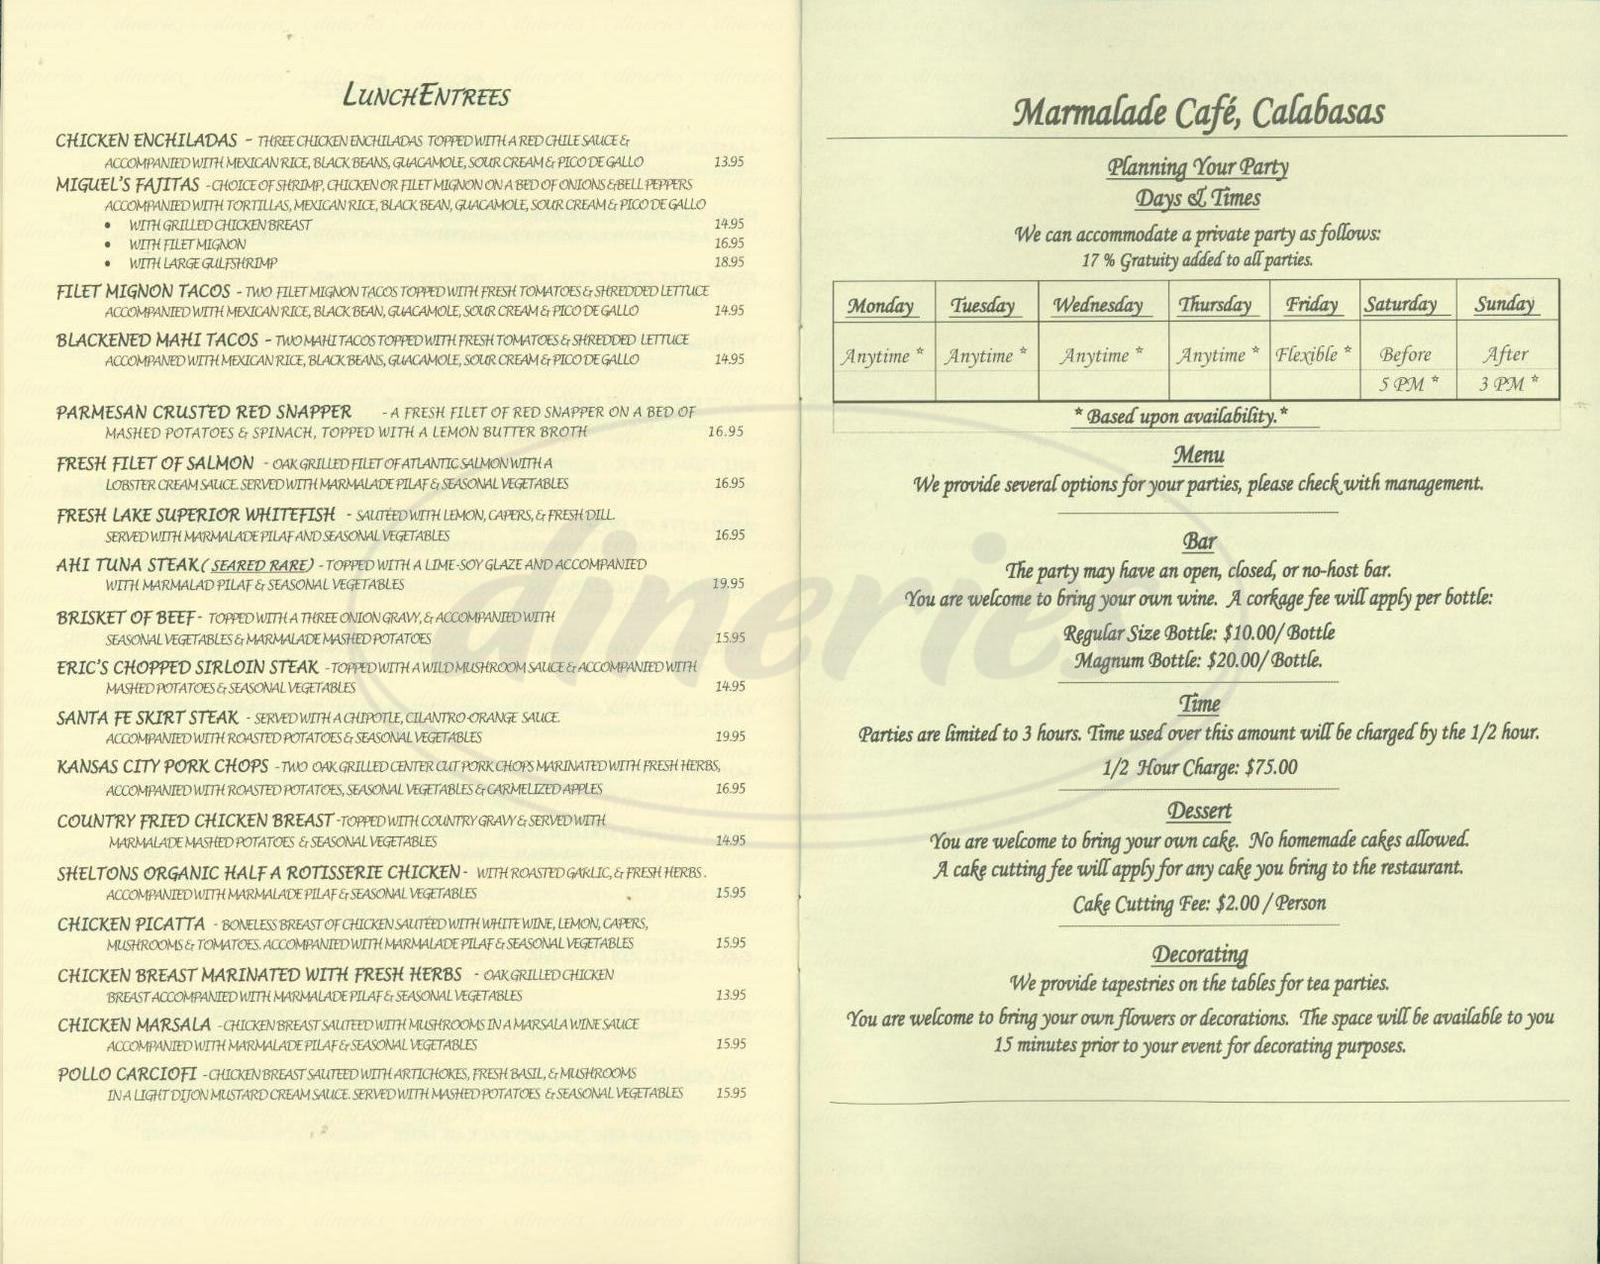 Permalink to Marmalade Cafe Menu